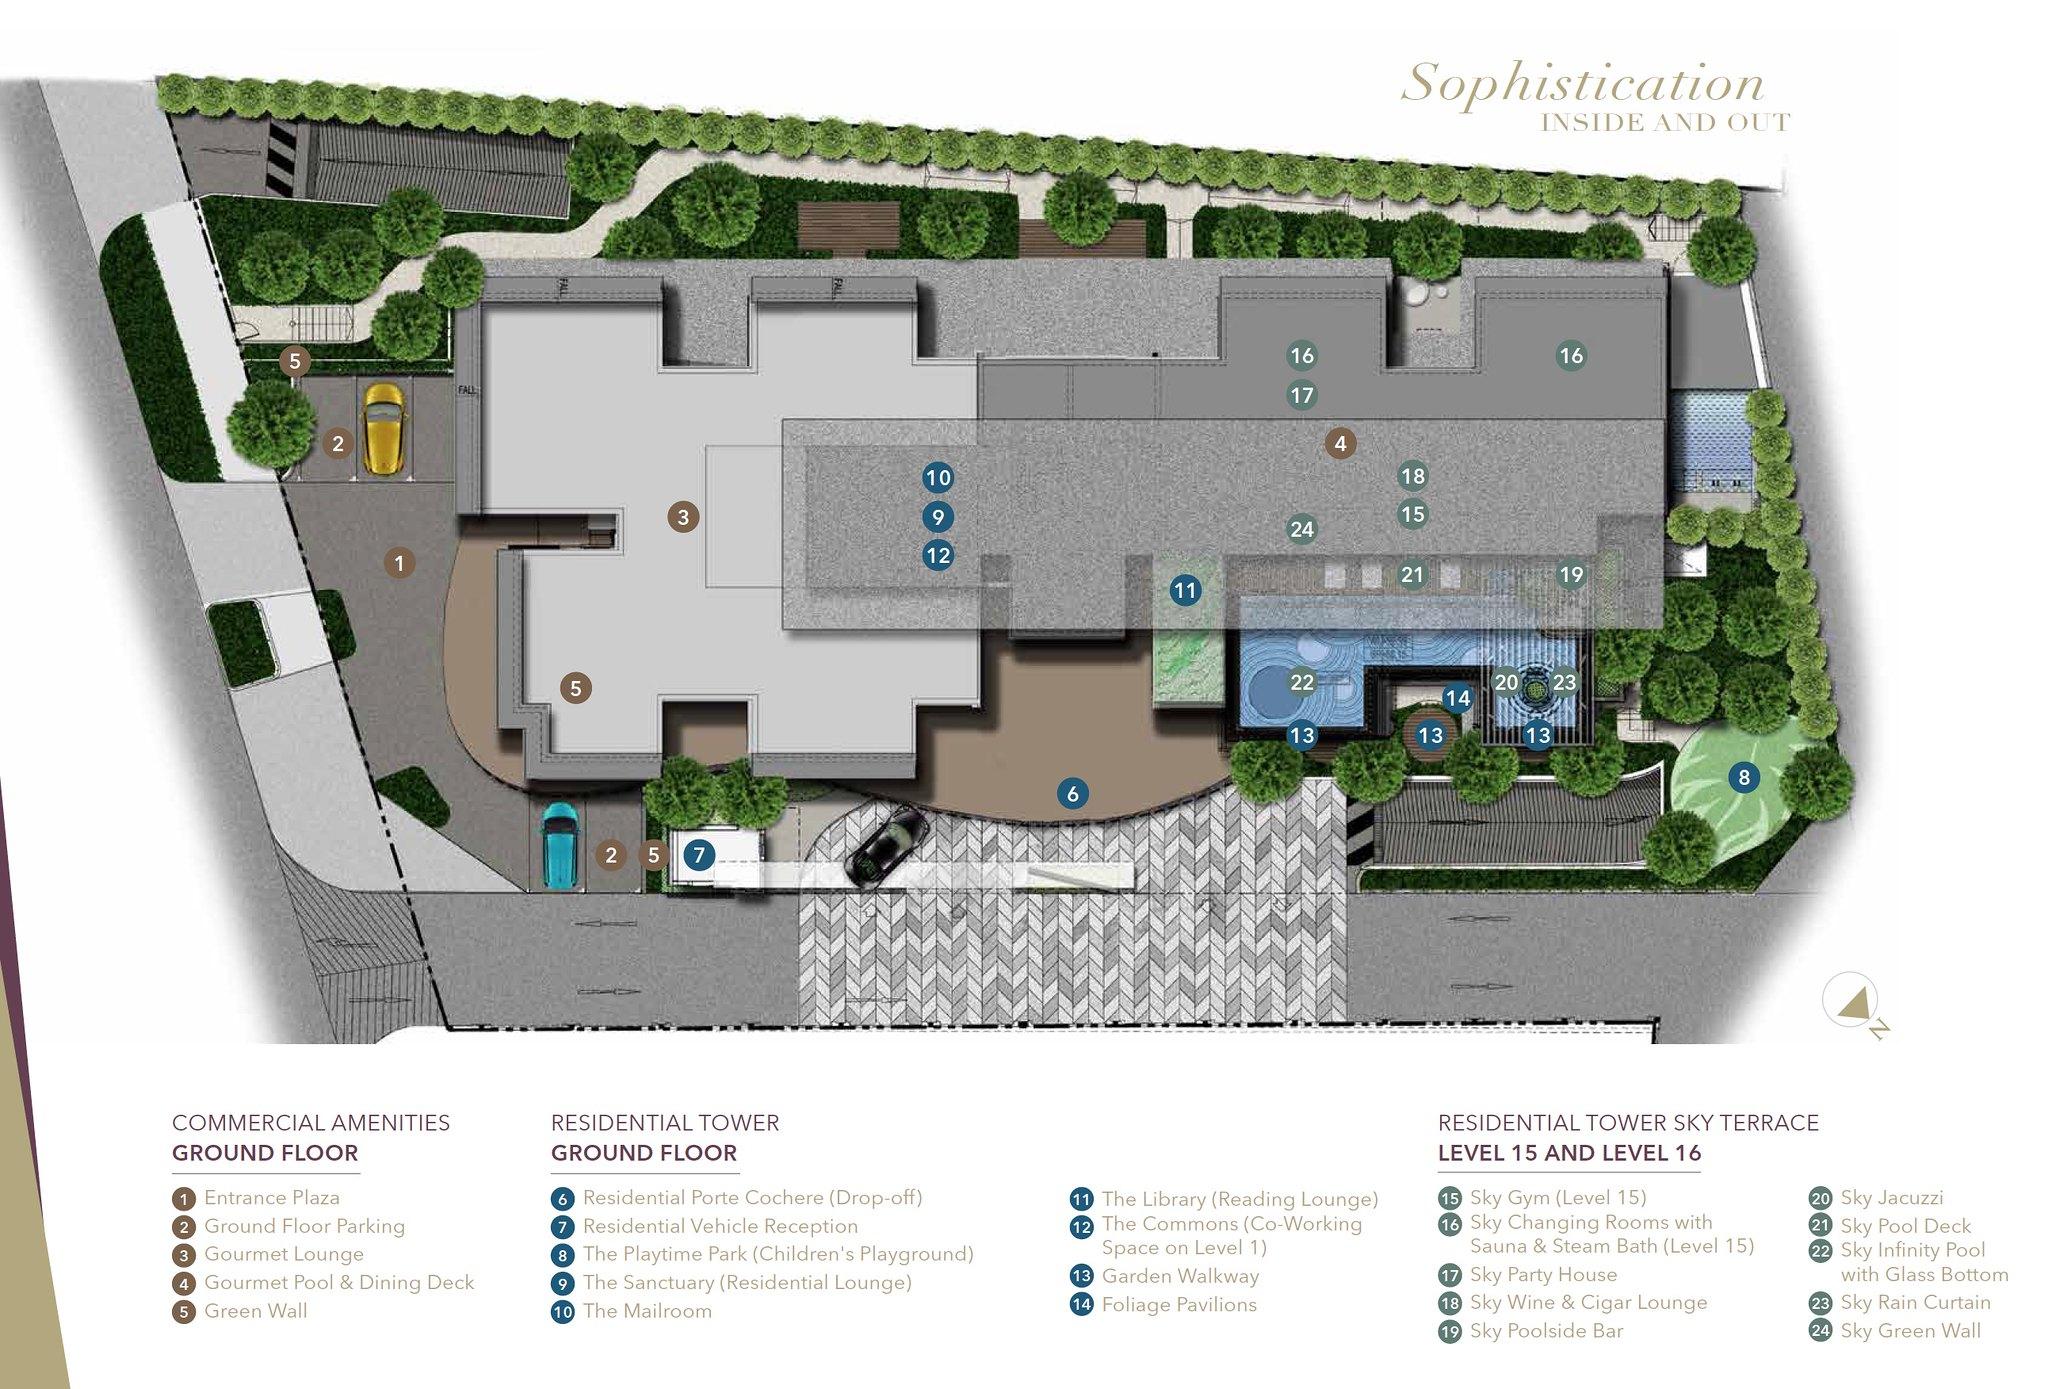 D1Mension CapitaLand quận 1 – Tòa nhà của những giấc mơ xa hoa. 7